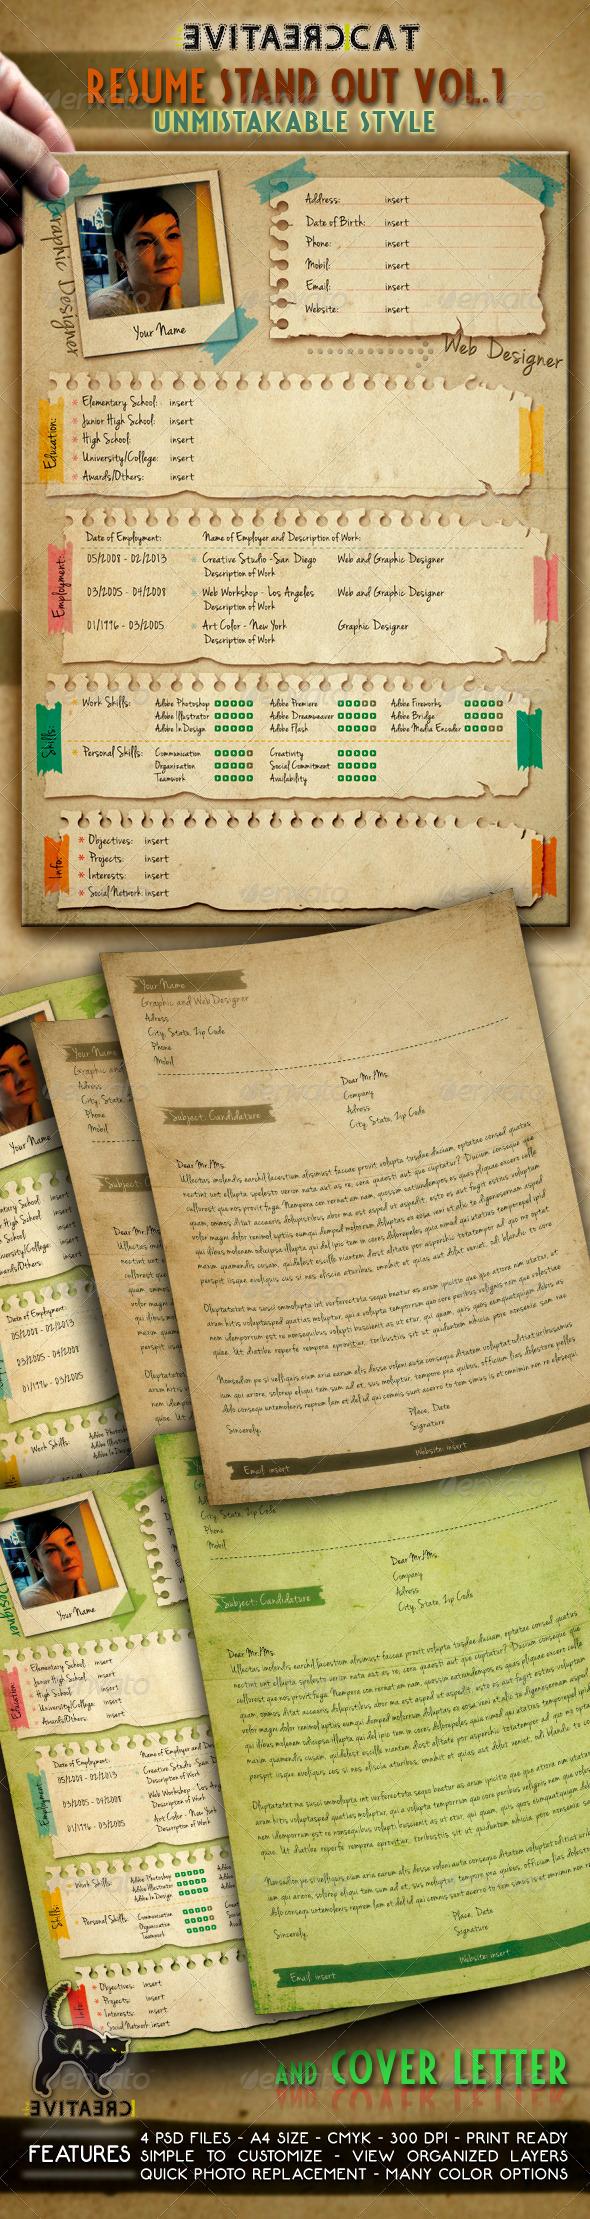 GraphicRiver Resume CV & Cover Letter Vol.1 5037665